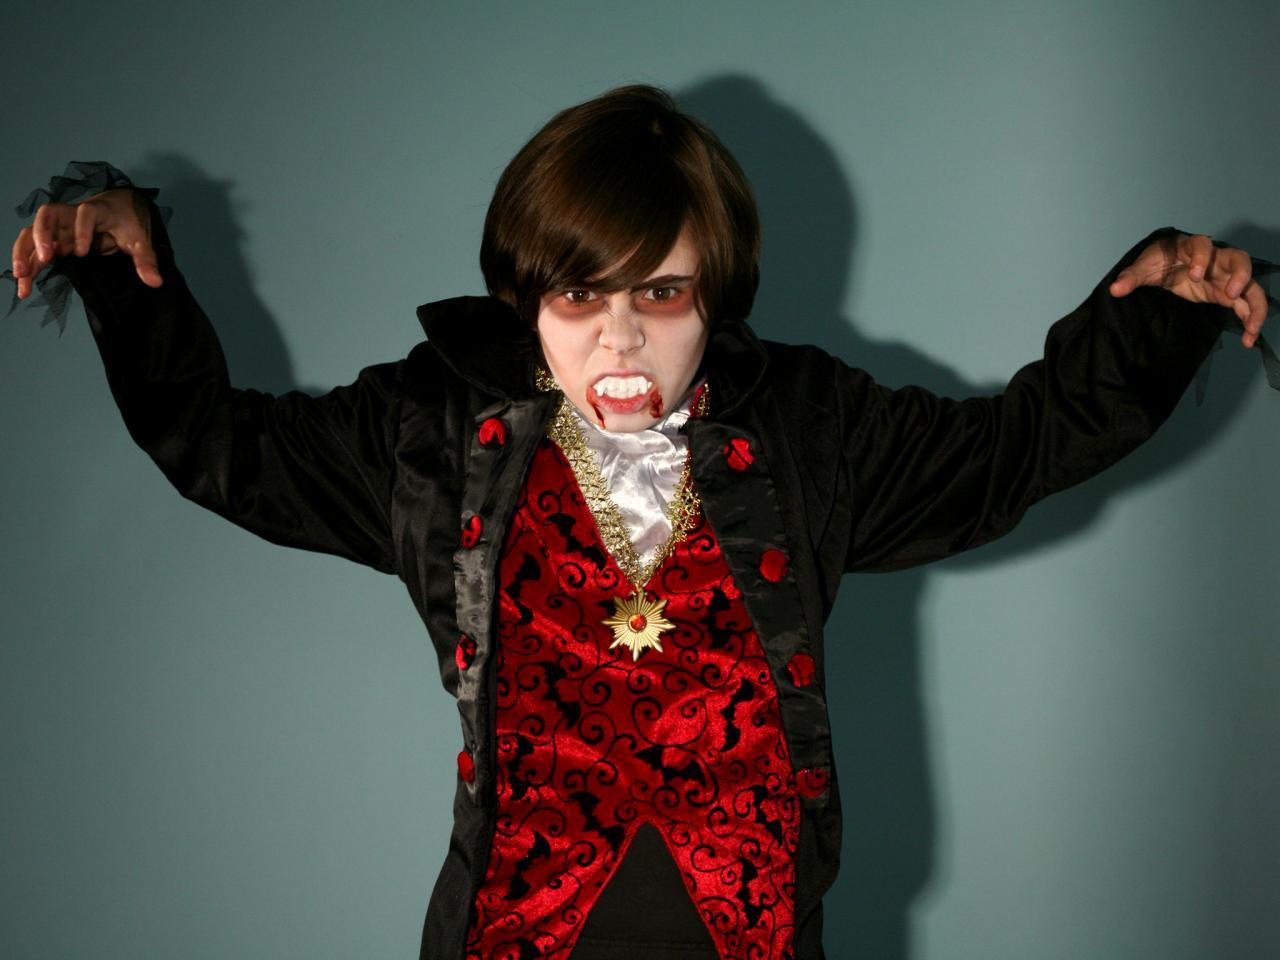 Vampire Halloween Makeup for Kids Tutorial   HGTV